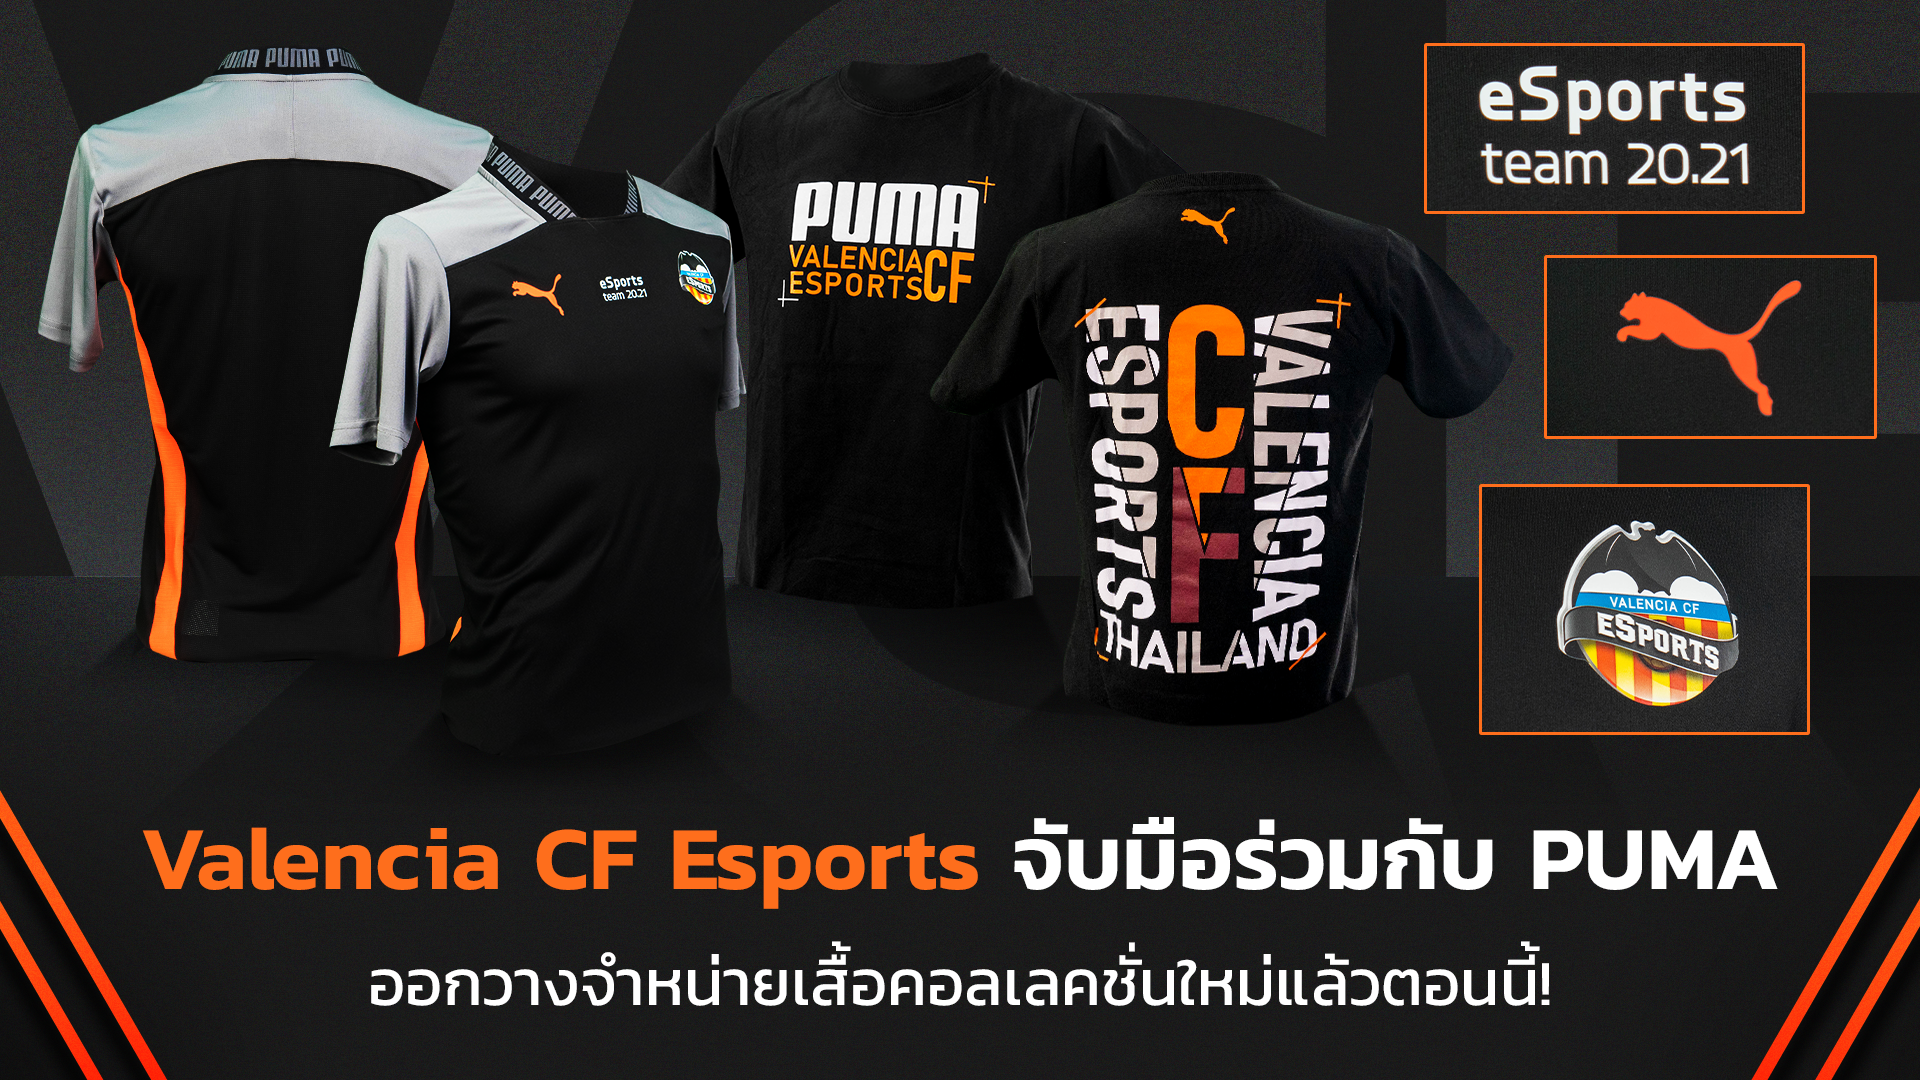 Valencia CF Esports ร่วมกับ PUMA ออกวางจำหน่ายเสื้อทีมคอลเลคชั่นใหม่แล้ว!